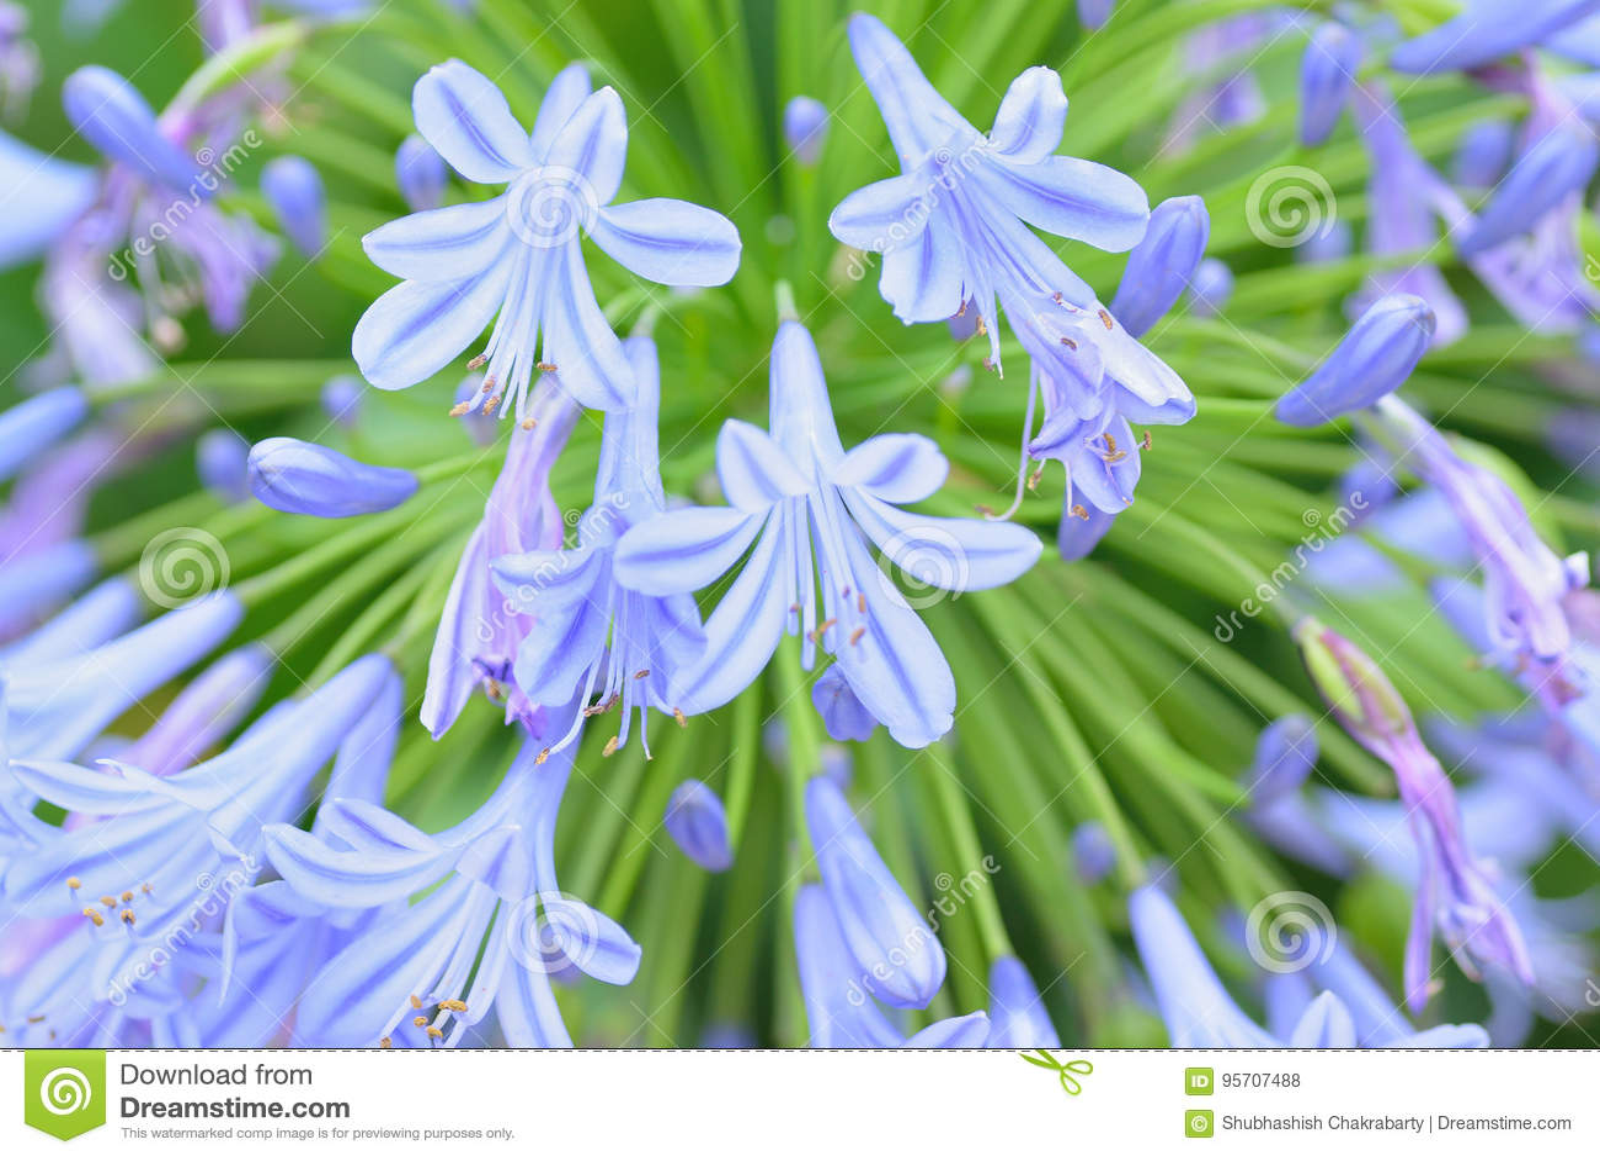 Macro details of white blue lily flowers stock photo image of royalty free stock photo izmirmasajfo